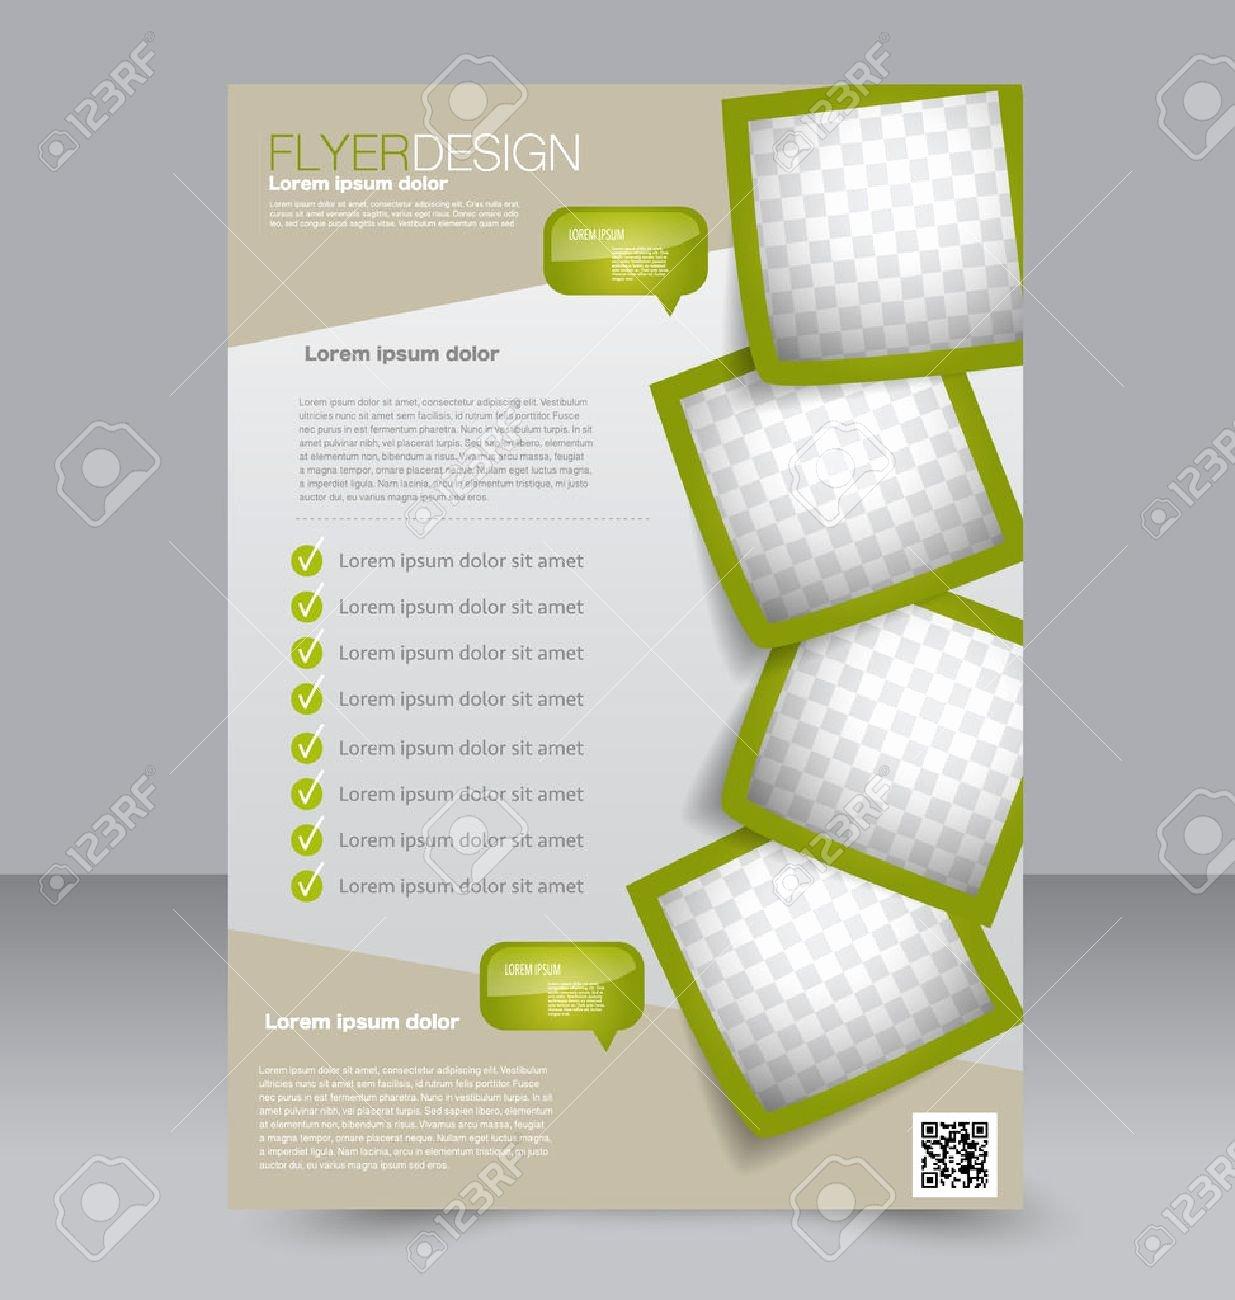 Flyer Template Brochure Design Editable A Poster for